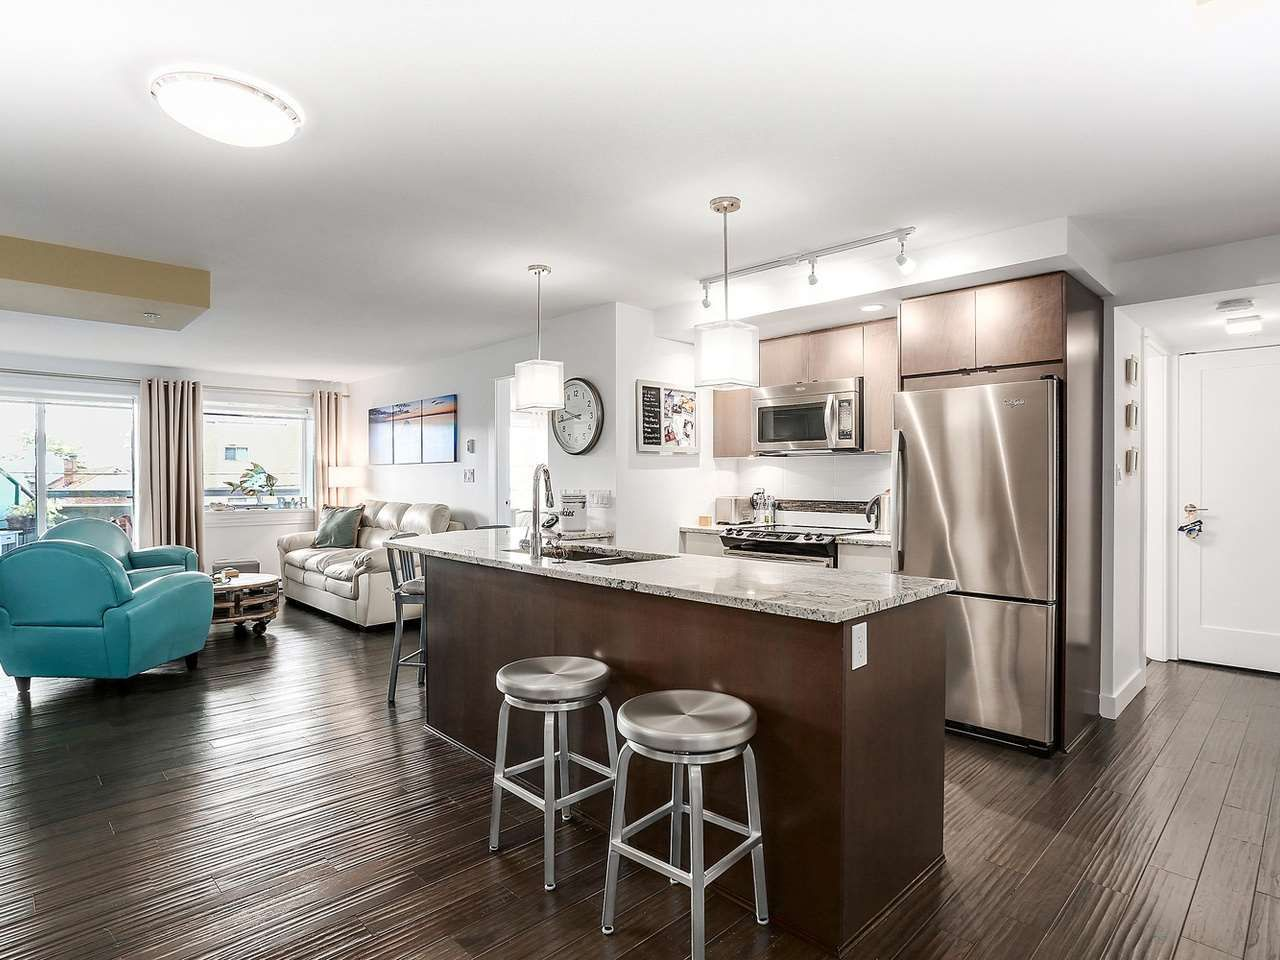 "Photo 8: Photos: 202 14955 VICTORIA Avenue: White Rock Condo for sale in ""SAUSALITO BEACH SIDE LIVING"" (South Surrey White Rock)  : MLS®# R2128764"